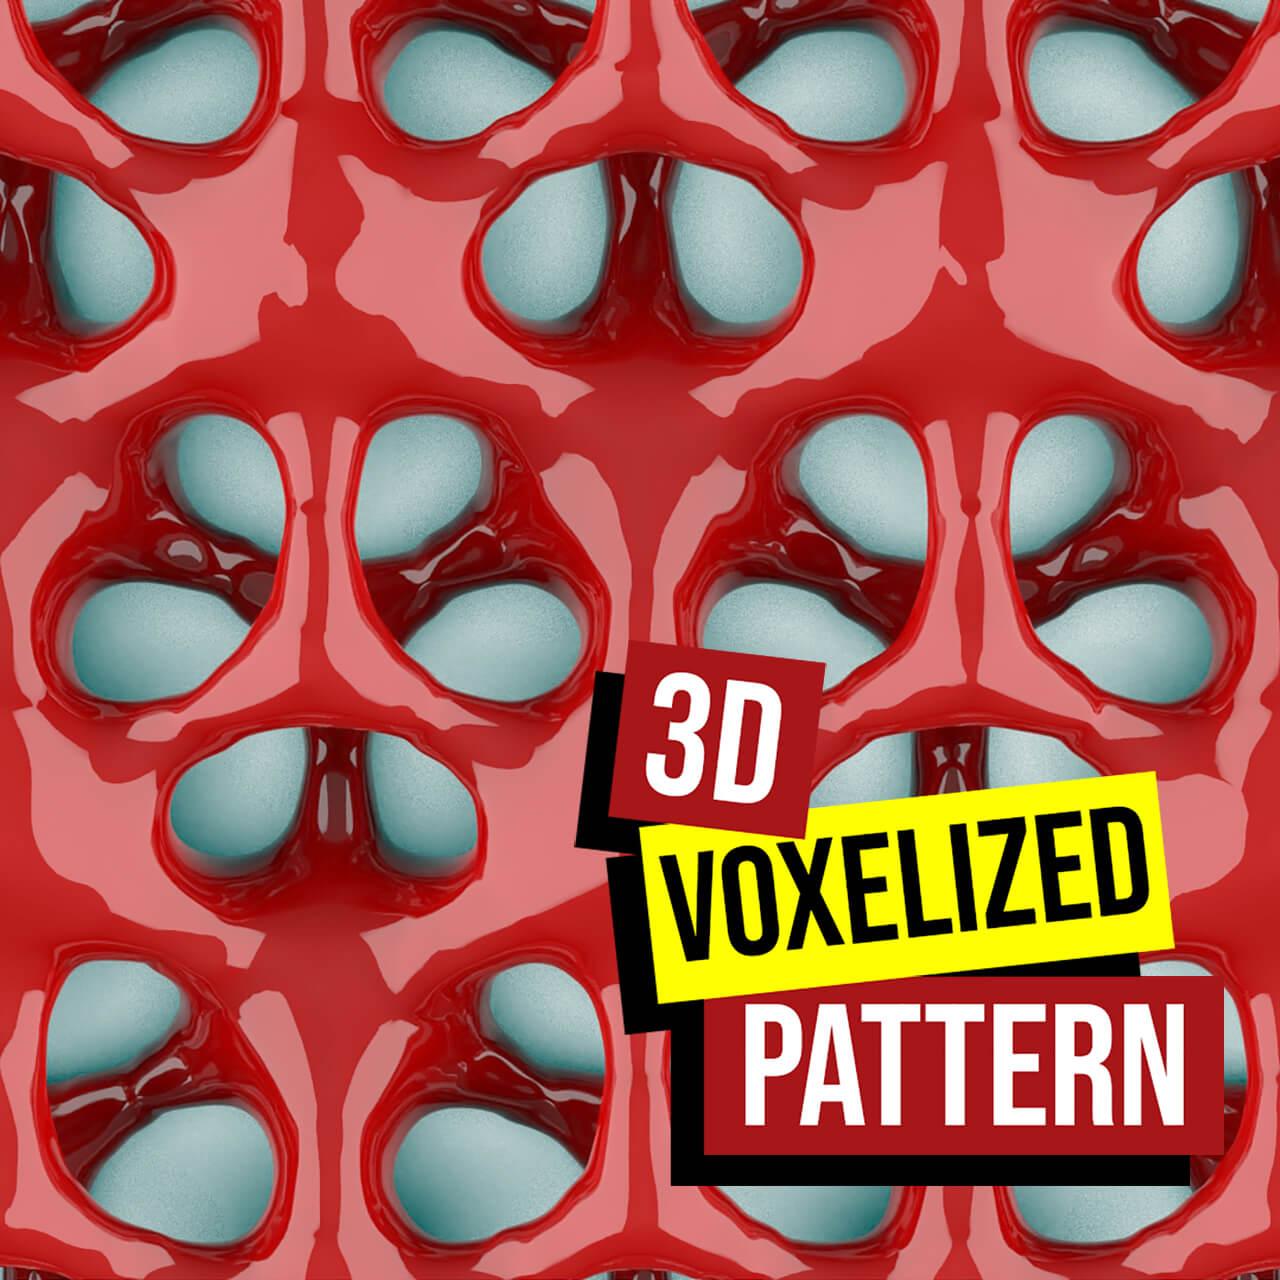 3d Voxelized pattern-1200